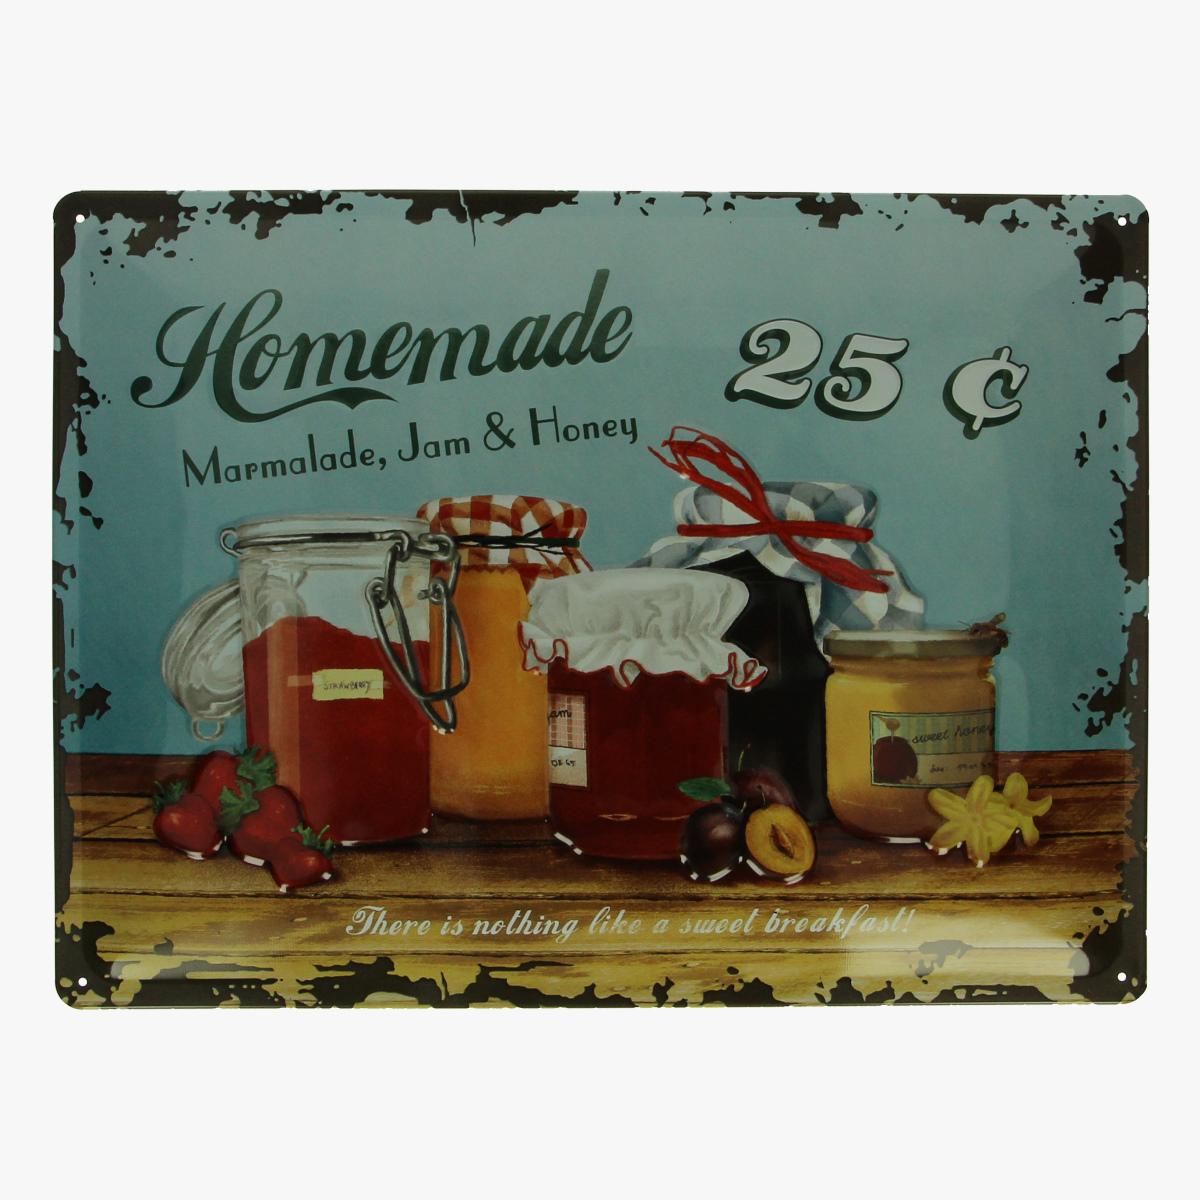 Afbeeldingen van blikken bord homemade Marmalada,Jam & Honey